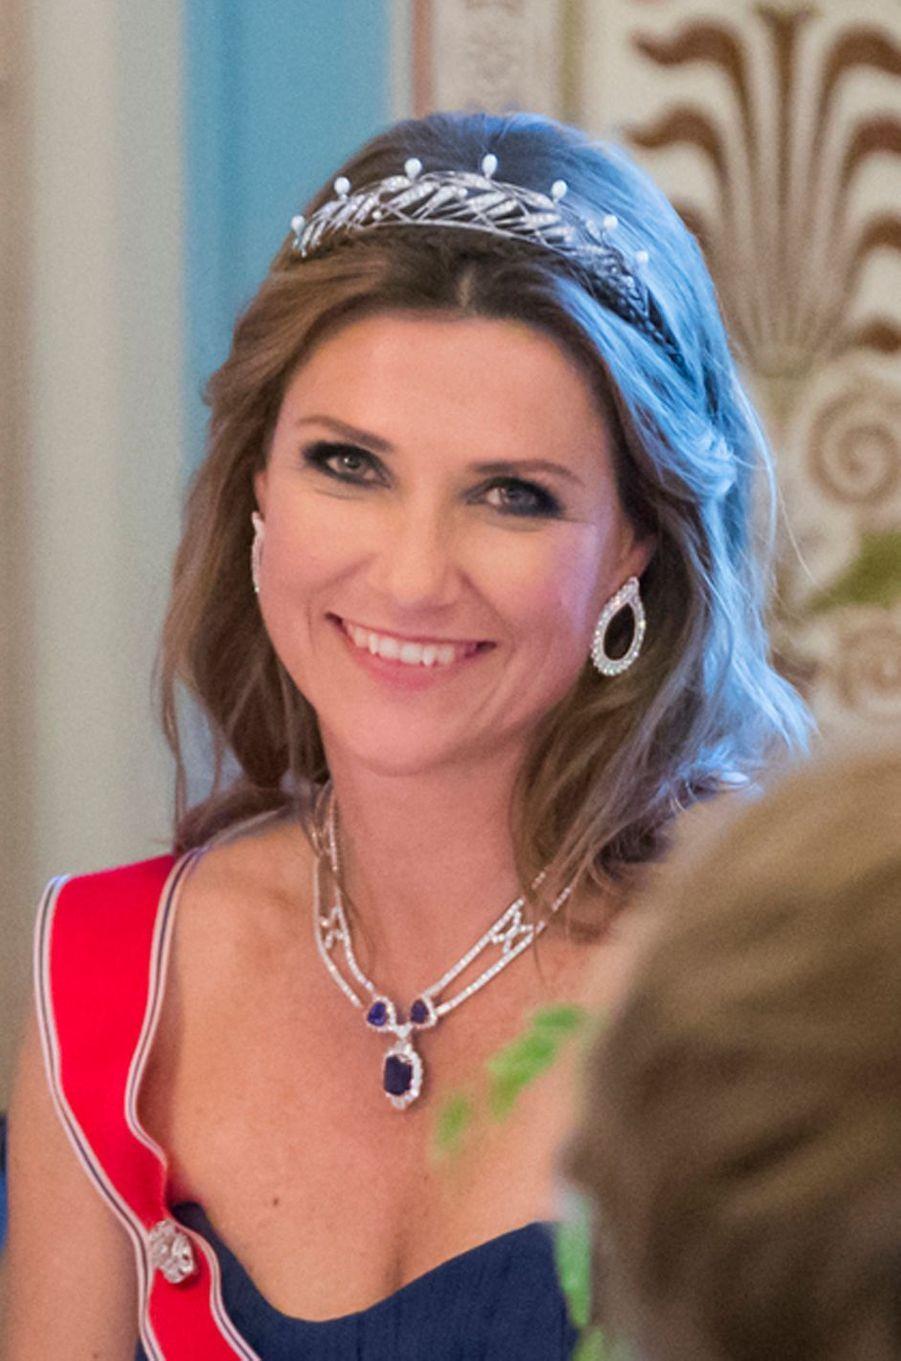 Le diadème de la princesse Märtha Louise de Norvège à Oslo le 9 mai 2017